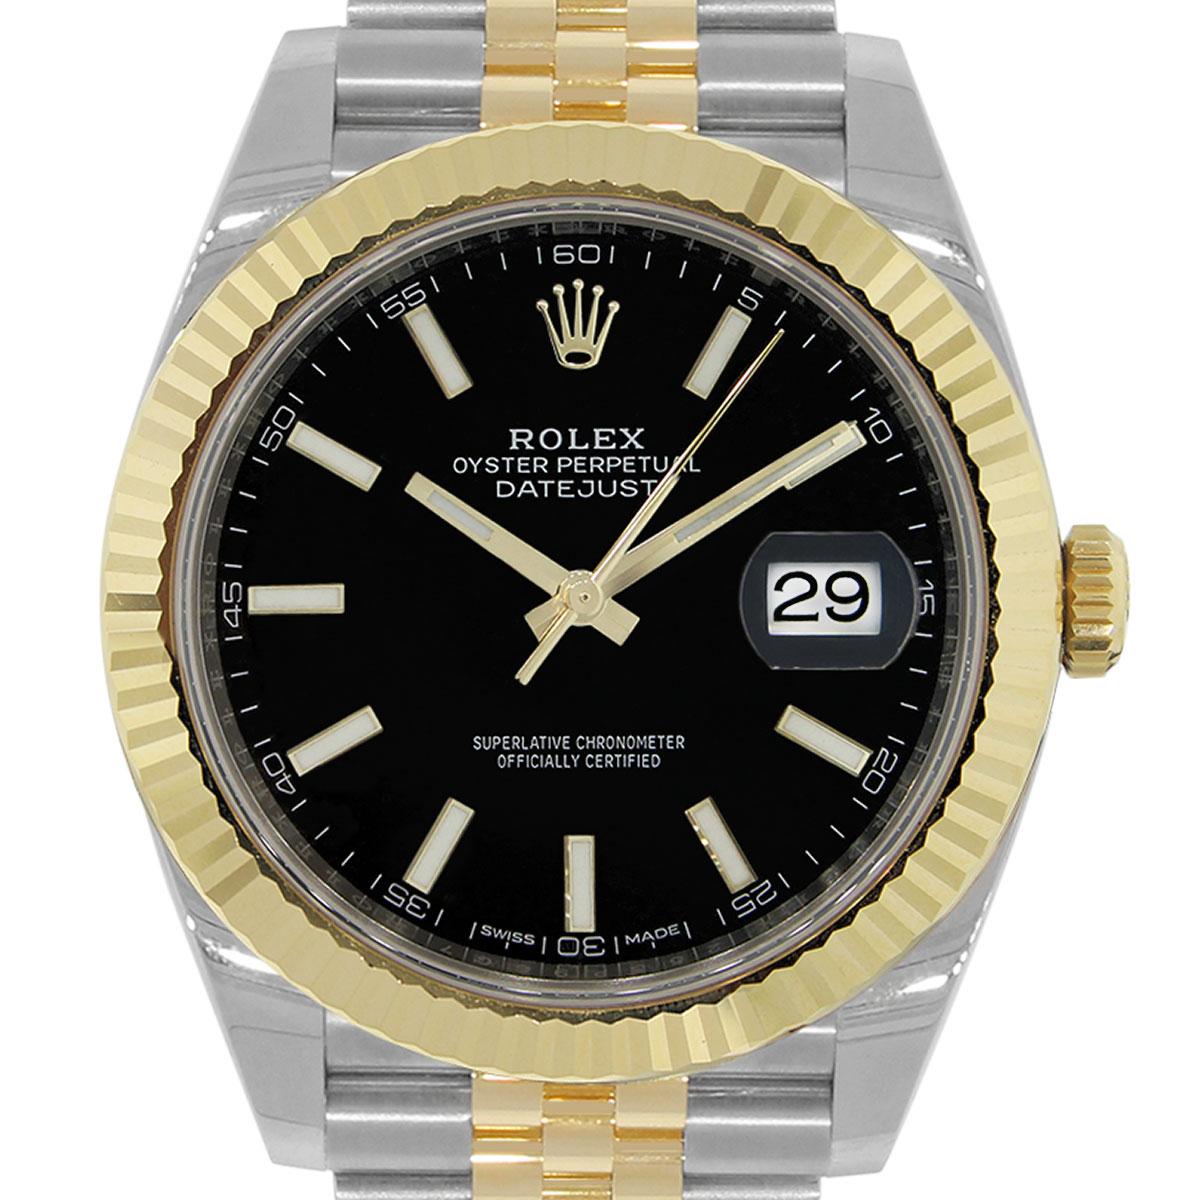 Rolex 126333 Datejust II 18kStainless Steel Black Dial Watch